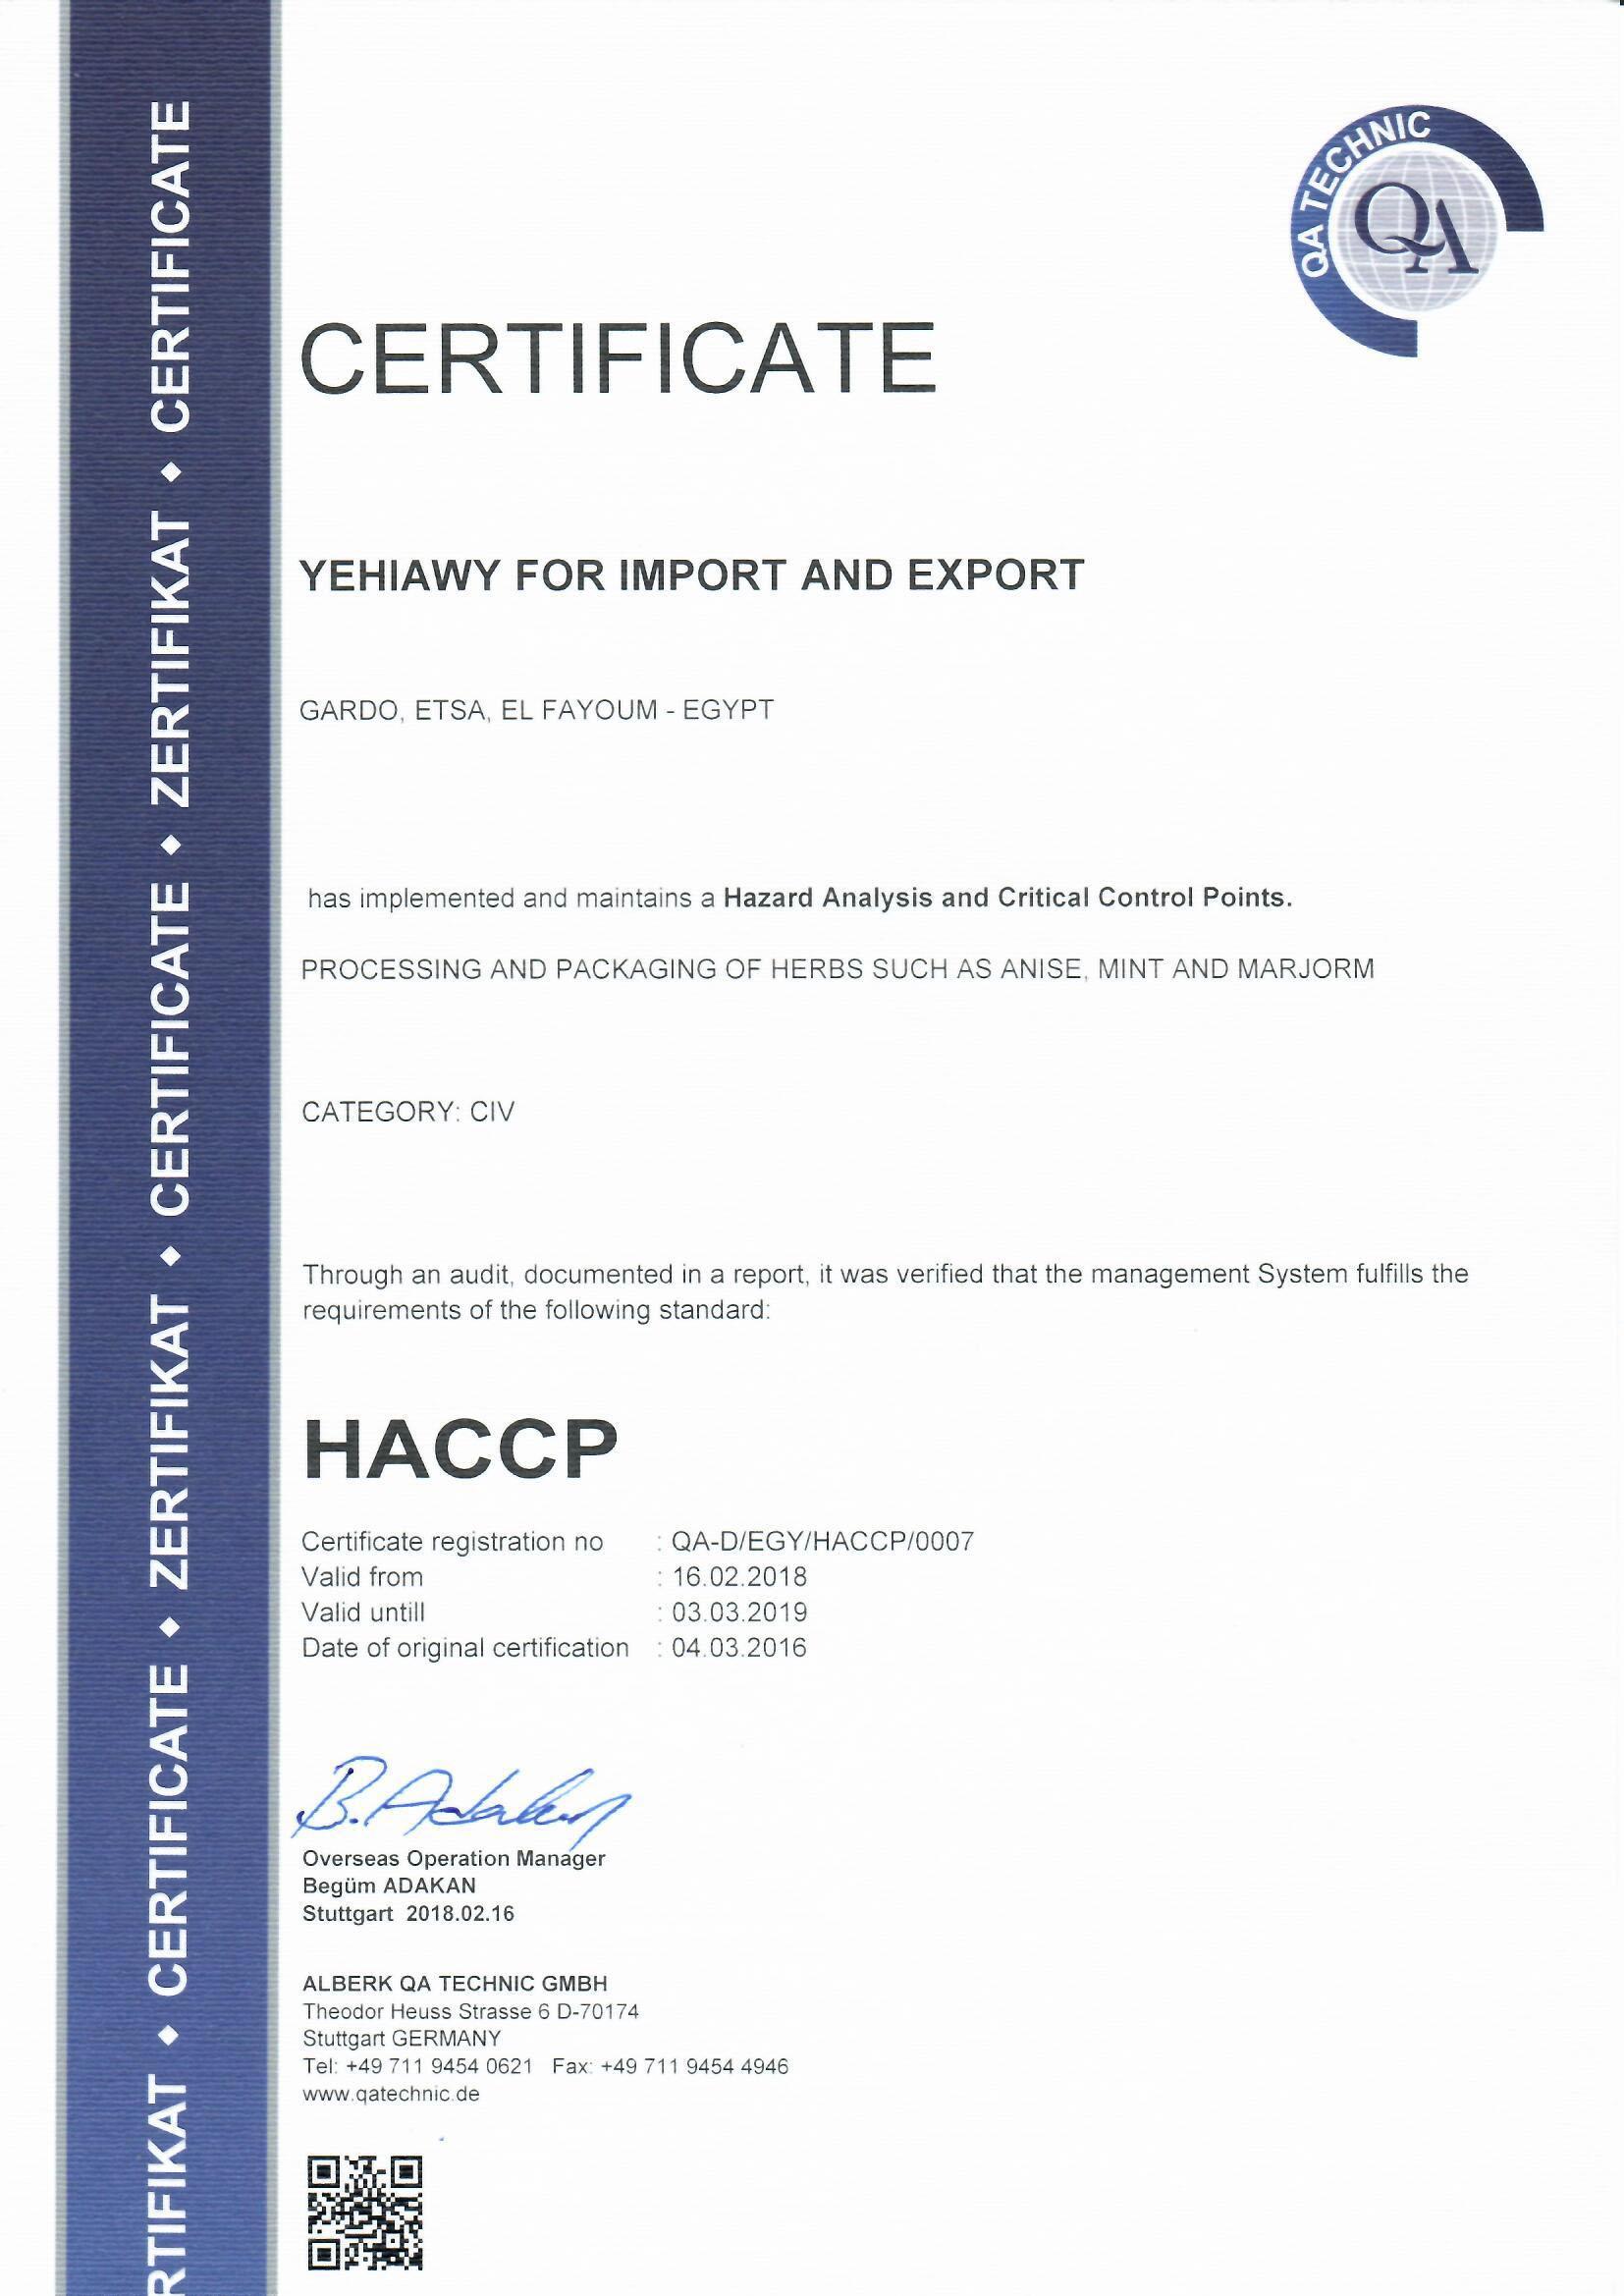 HACCP 2018